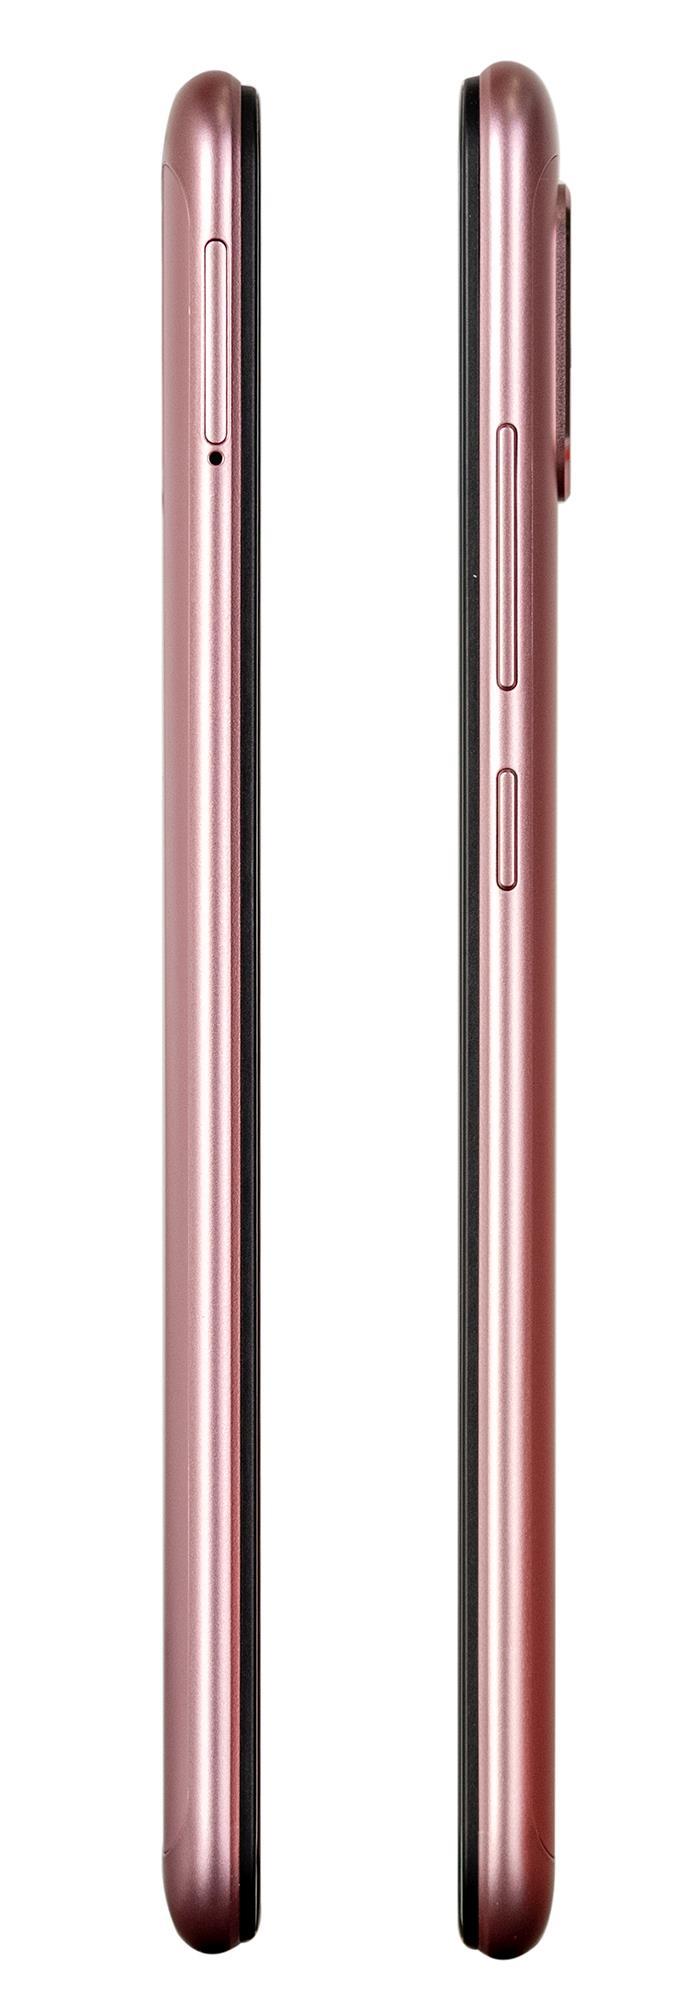 Xiaomi Redmi Note 6 Pro 4GB/64GB rose gold Mobilais Telefons